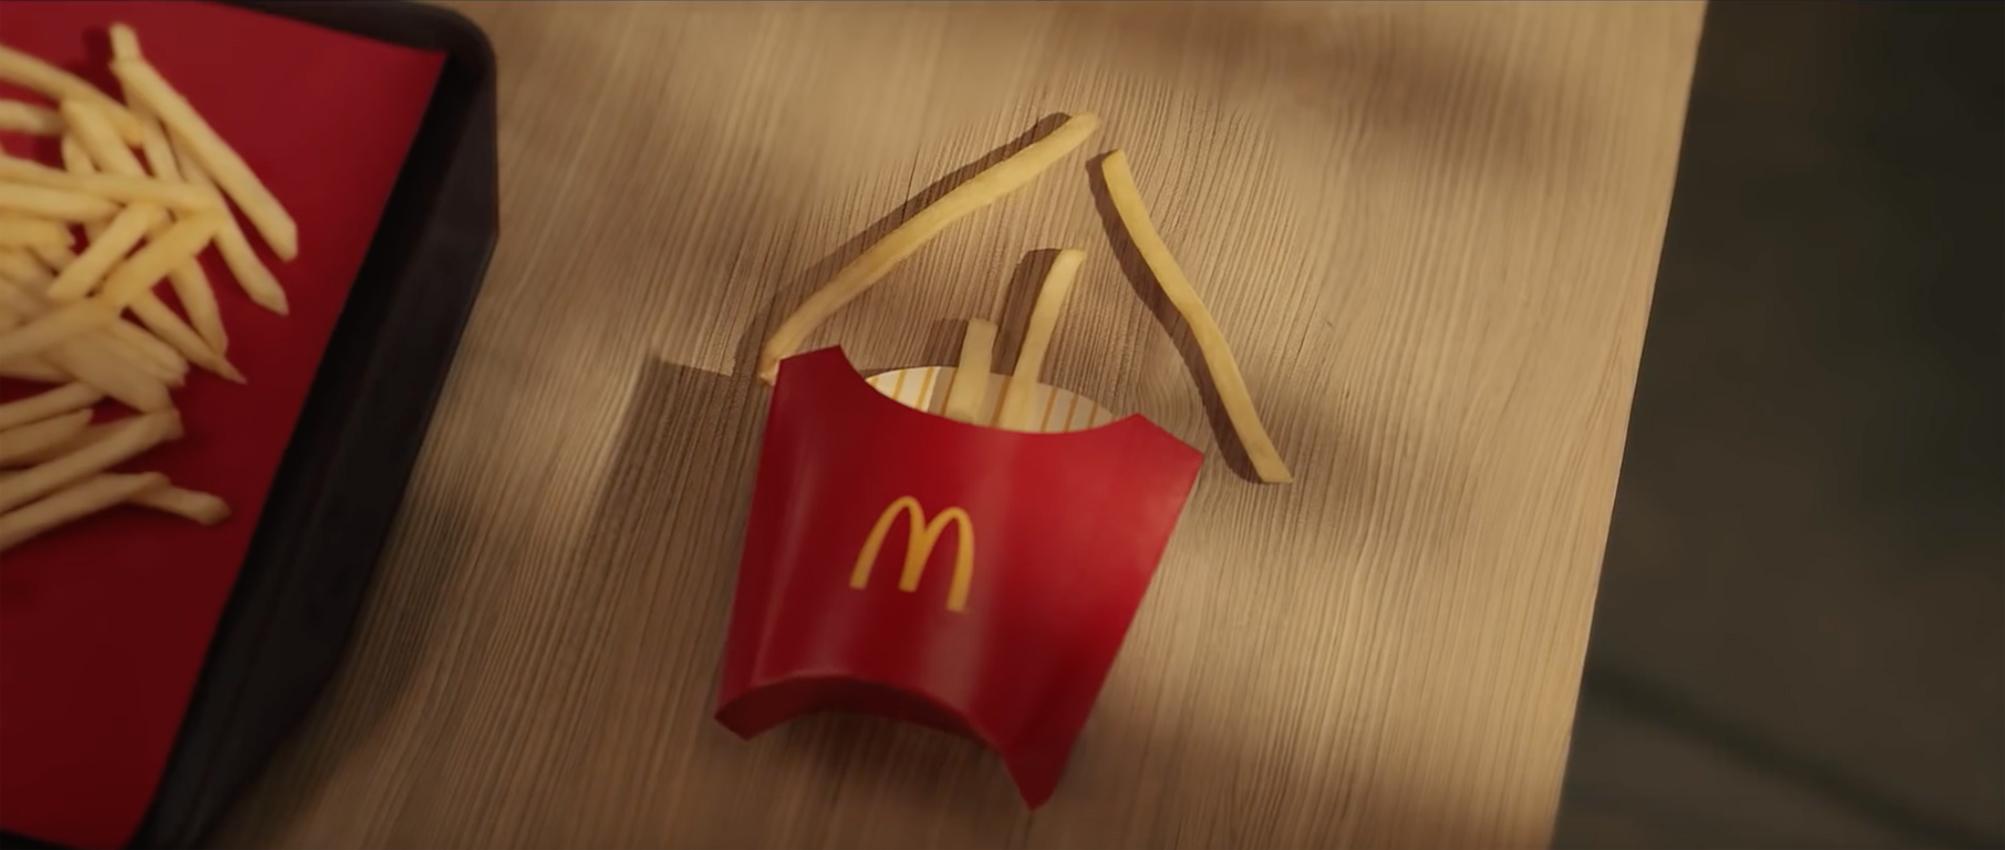 Leo Burnett Manila releases touching McDonald's Mother's Day message